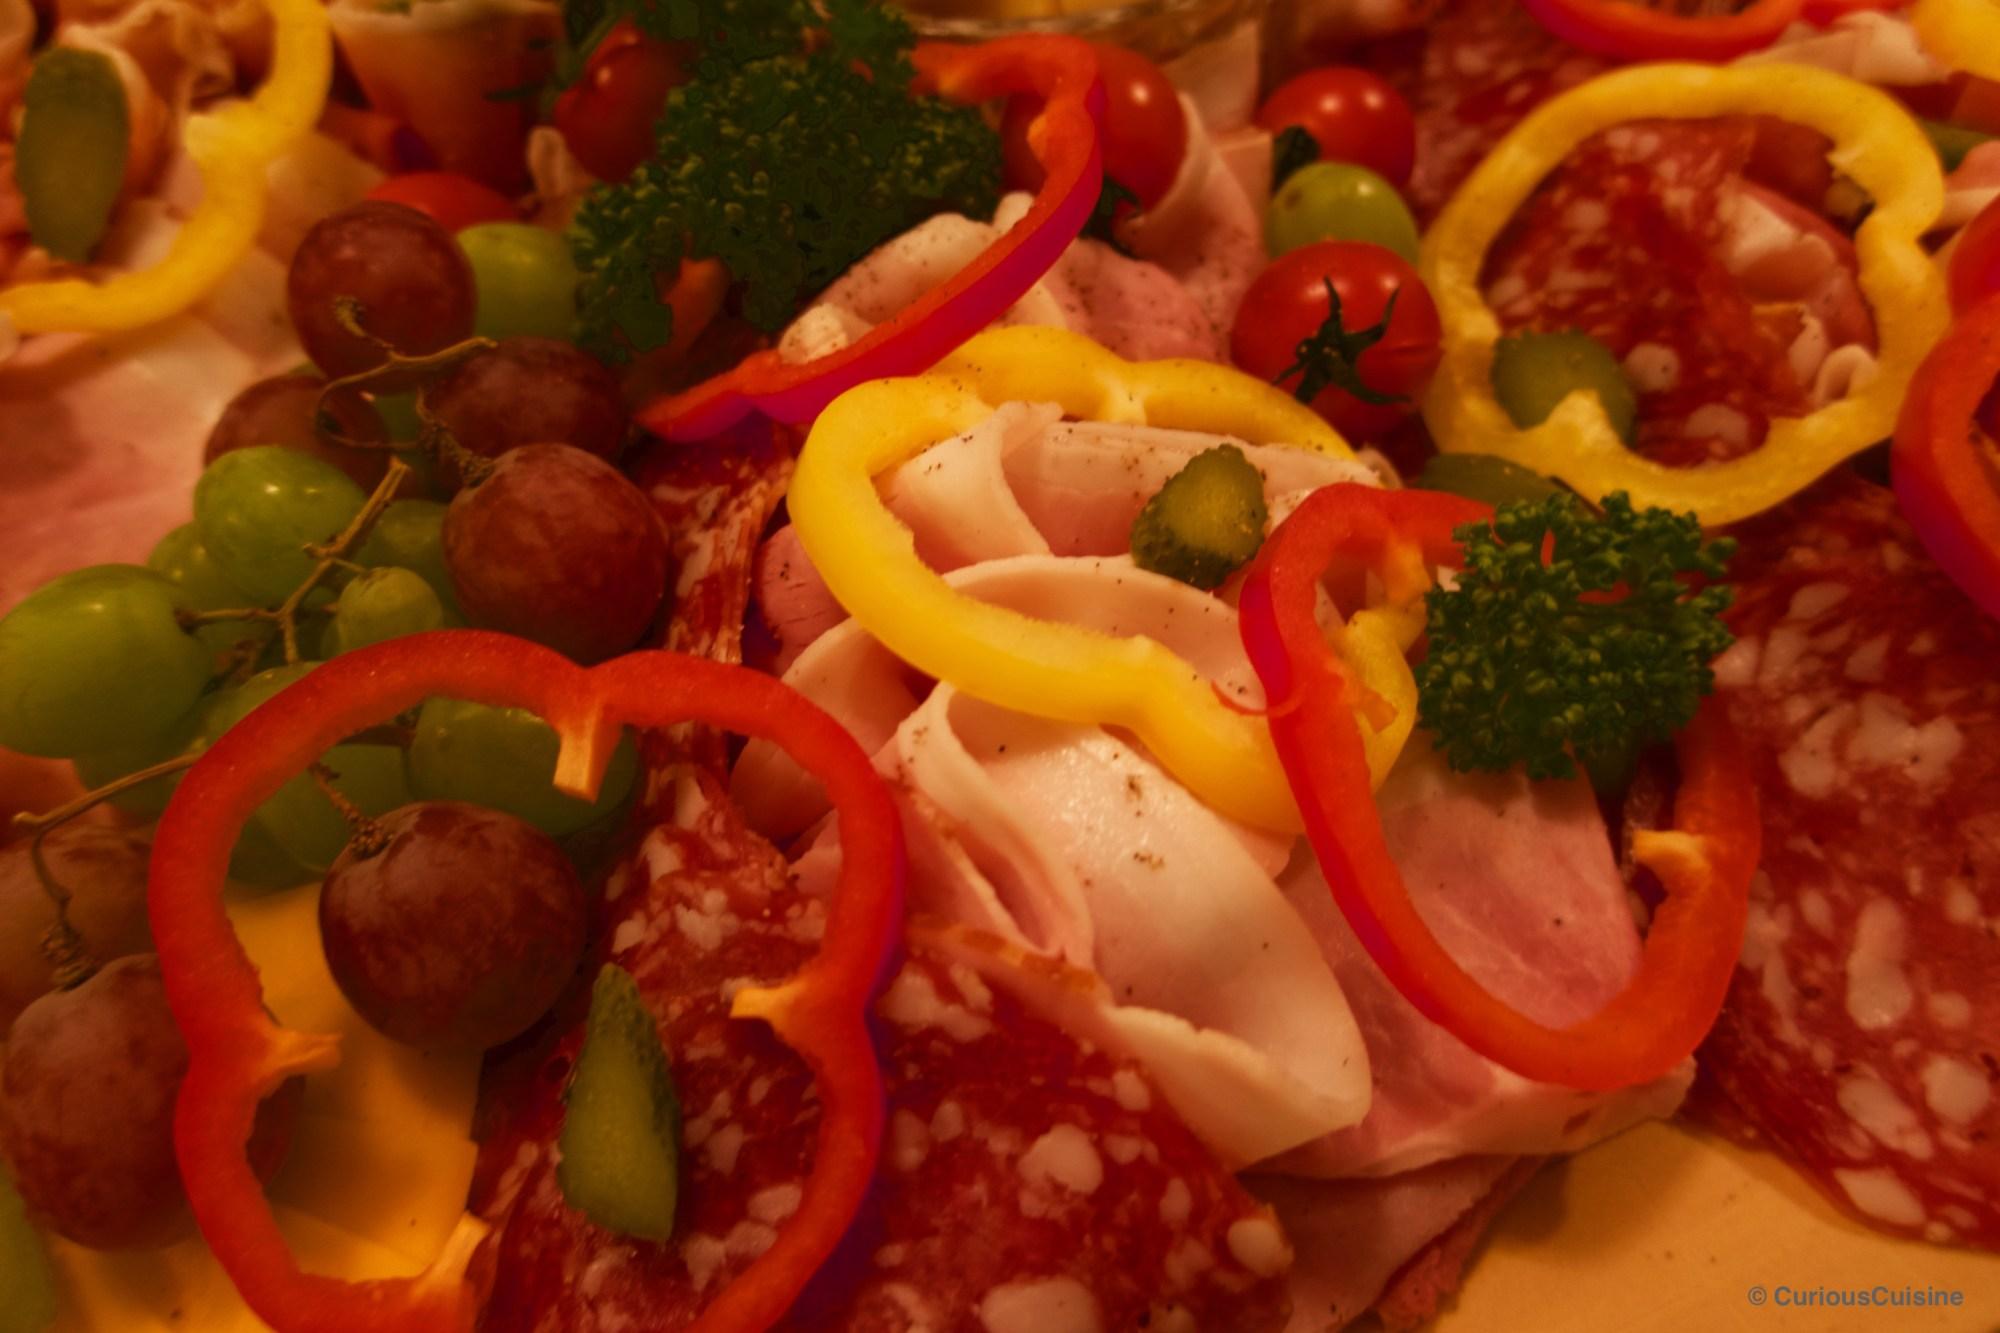 Showing Austrian food culture